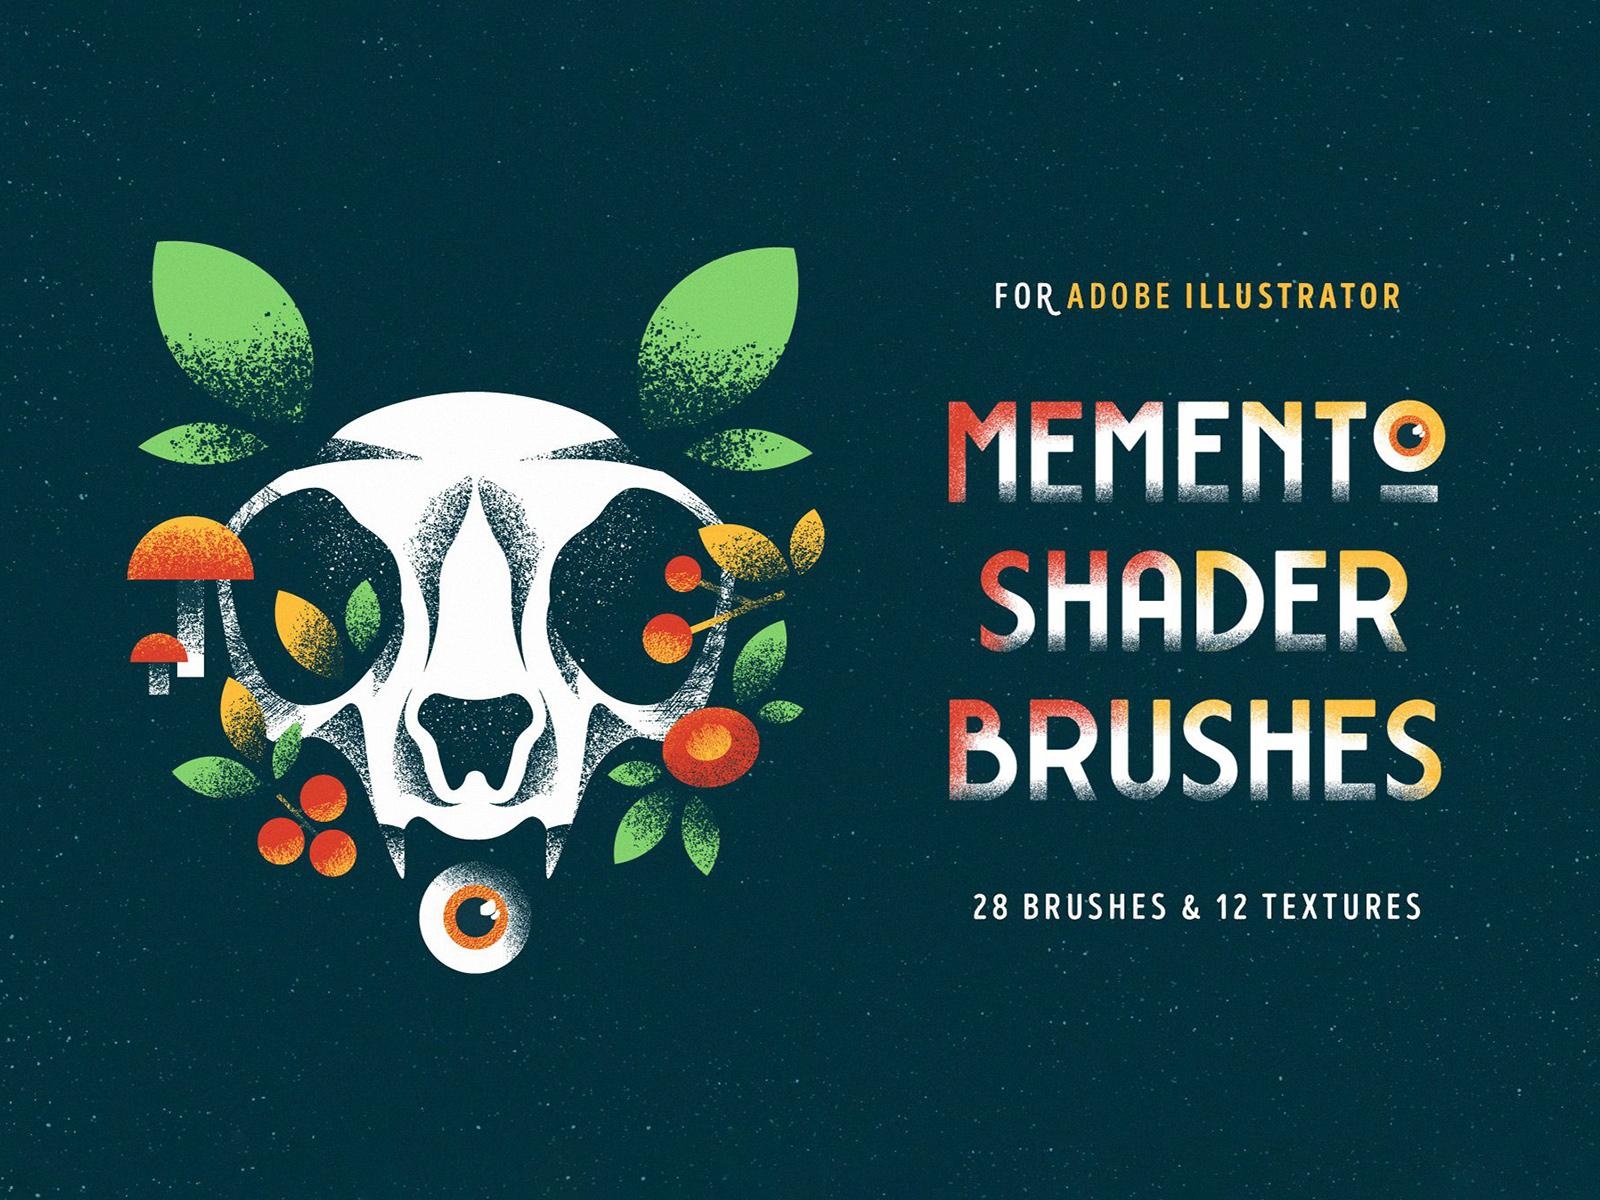 Shader brushes